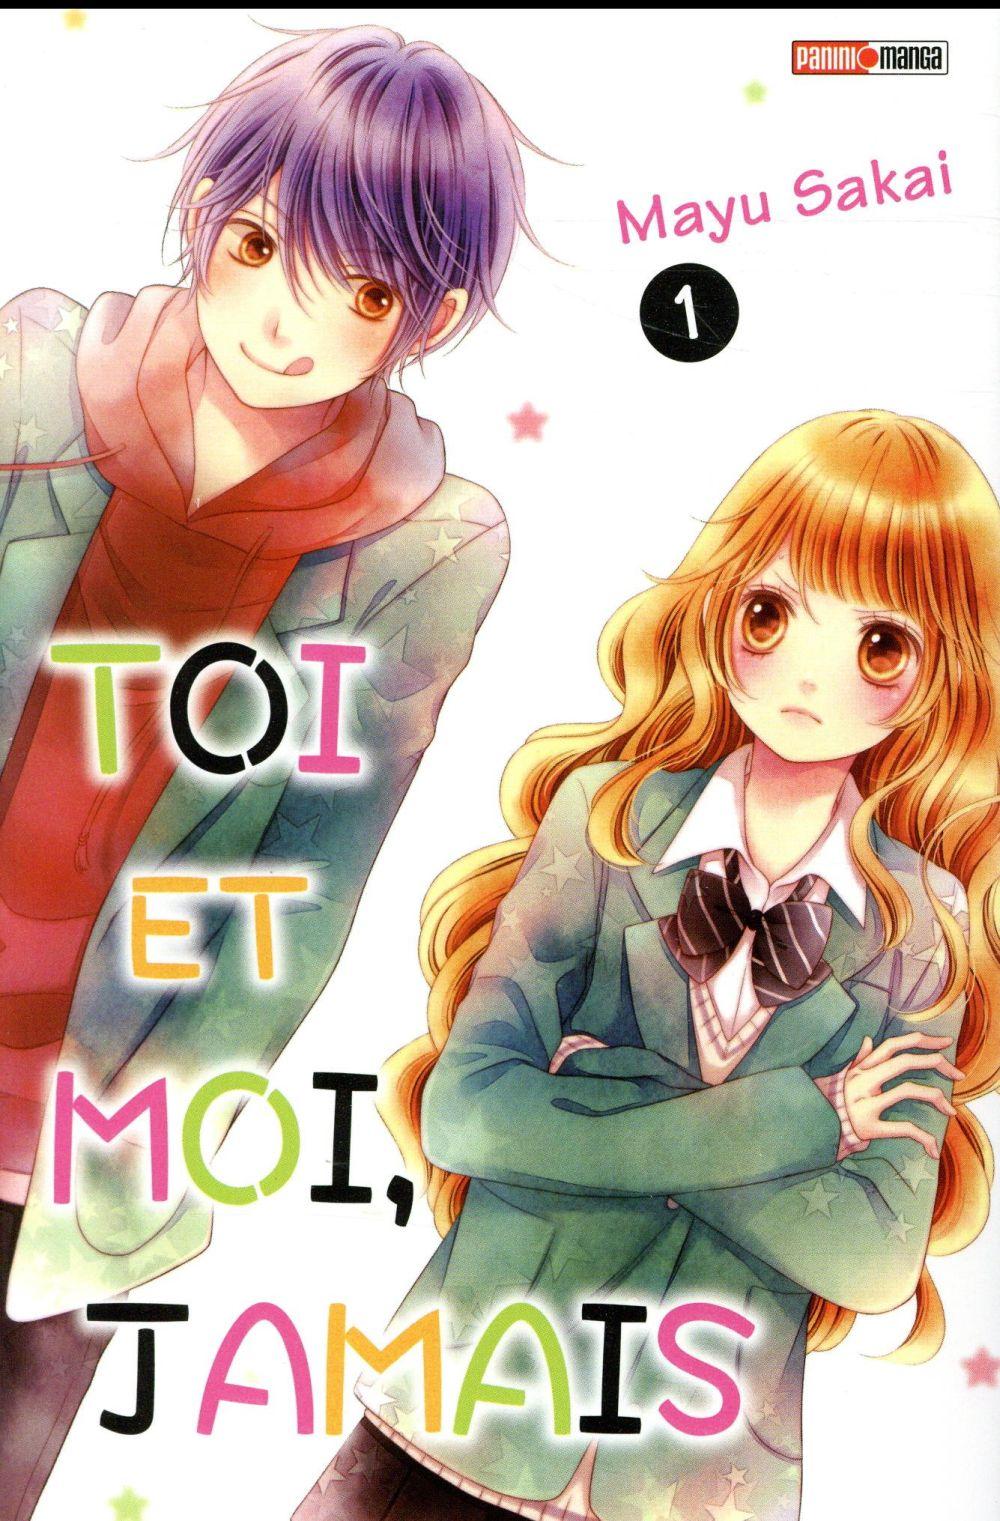 Toi Et Moi, Jamais T.1